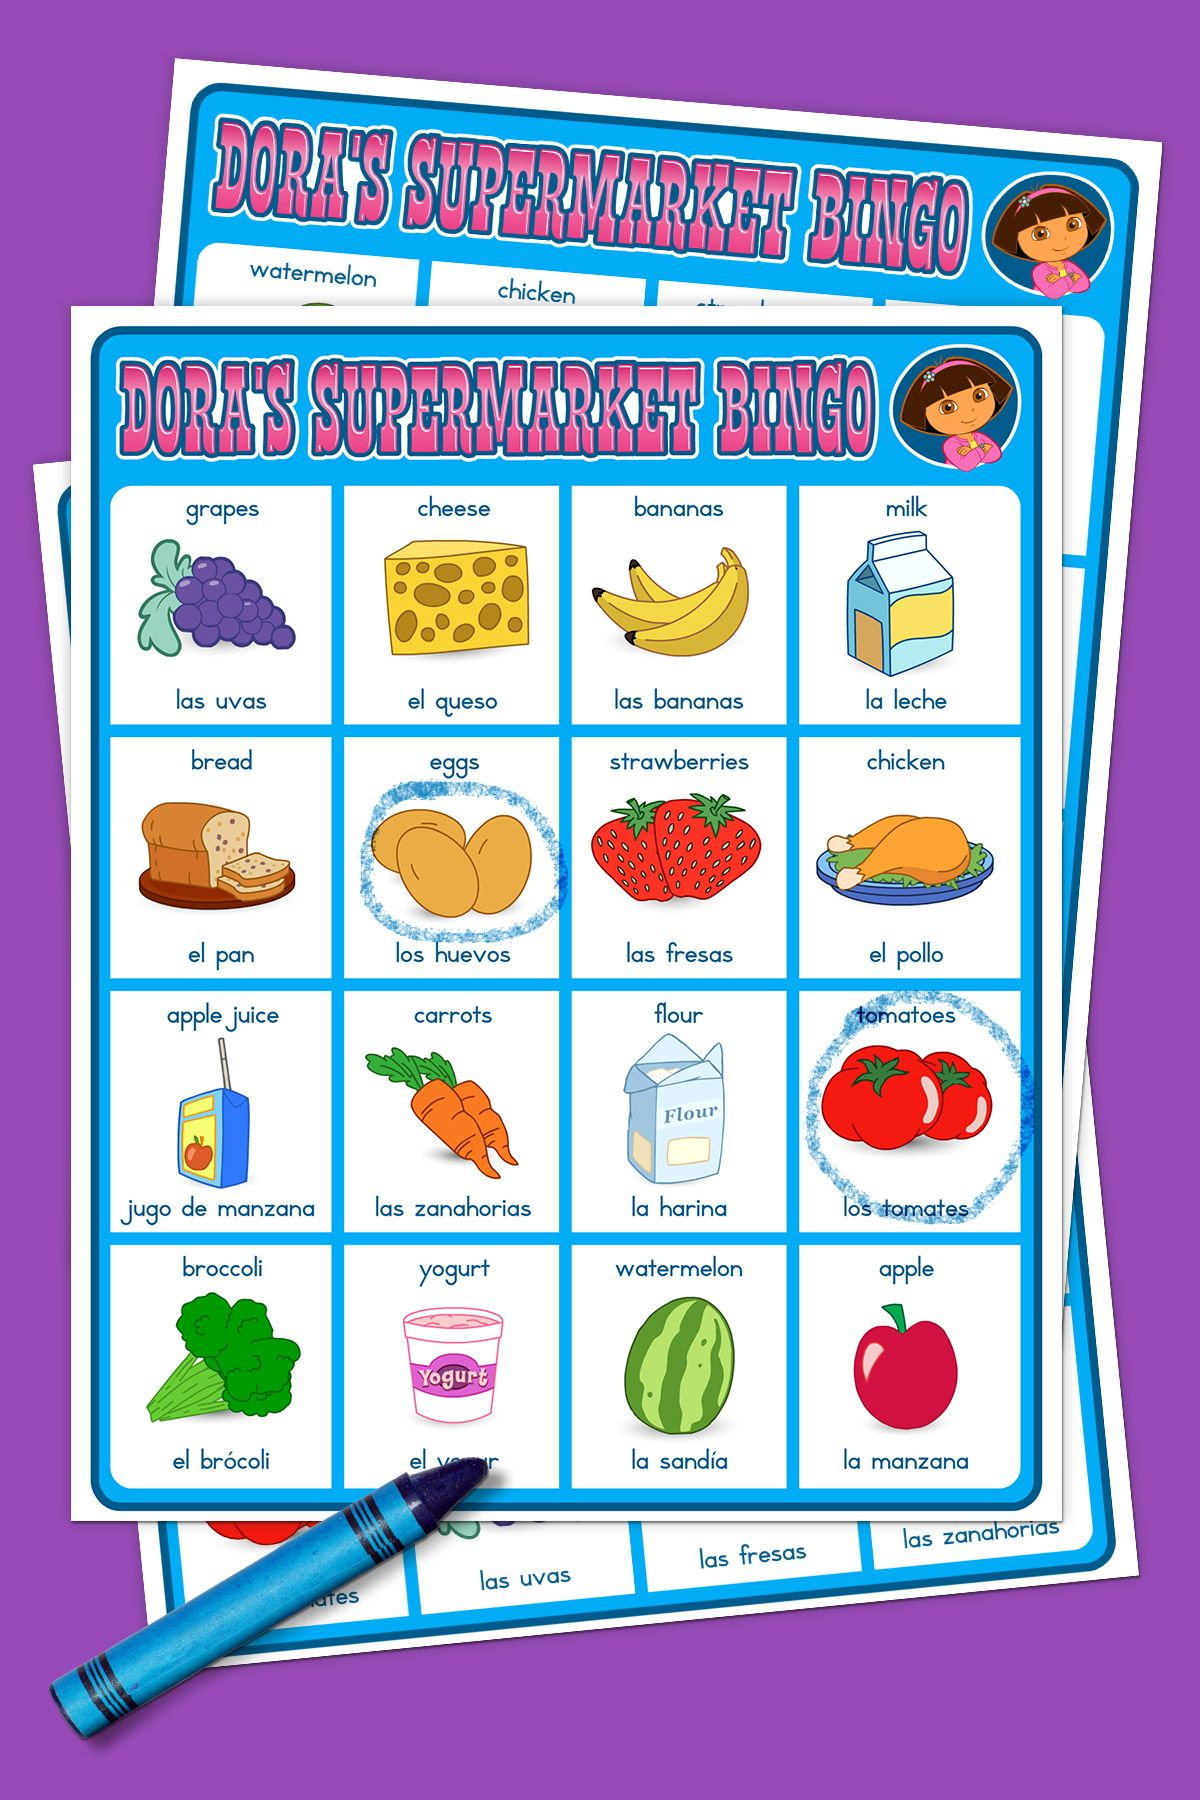 Dora Supermarket Bingo Game | Supermarket Games, Dora The